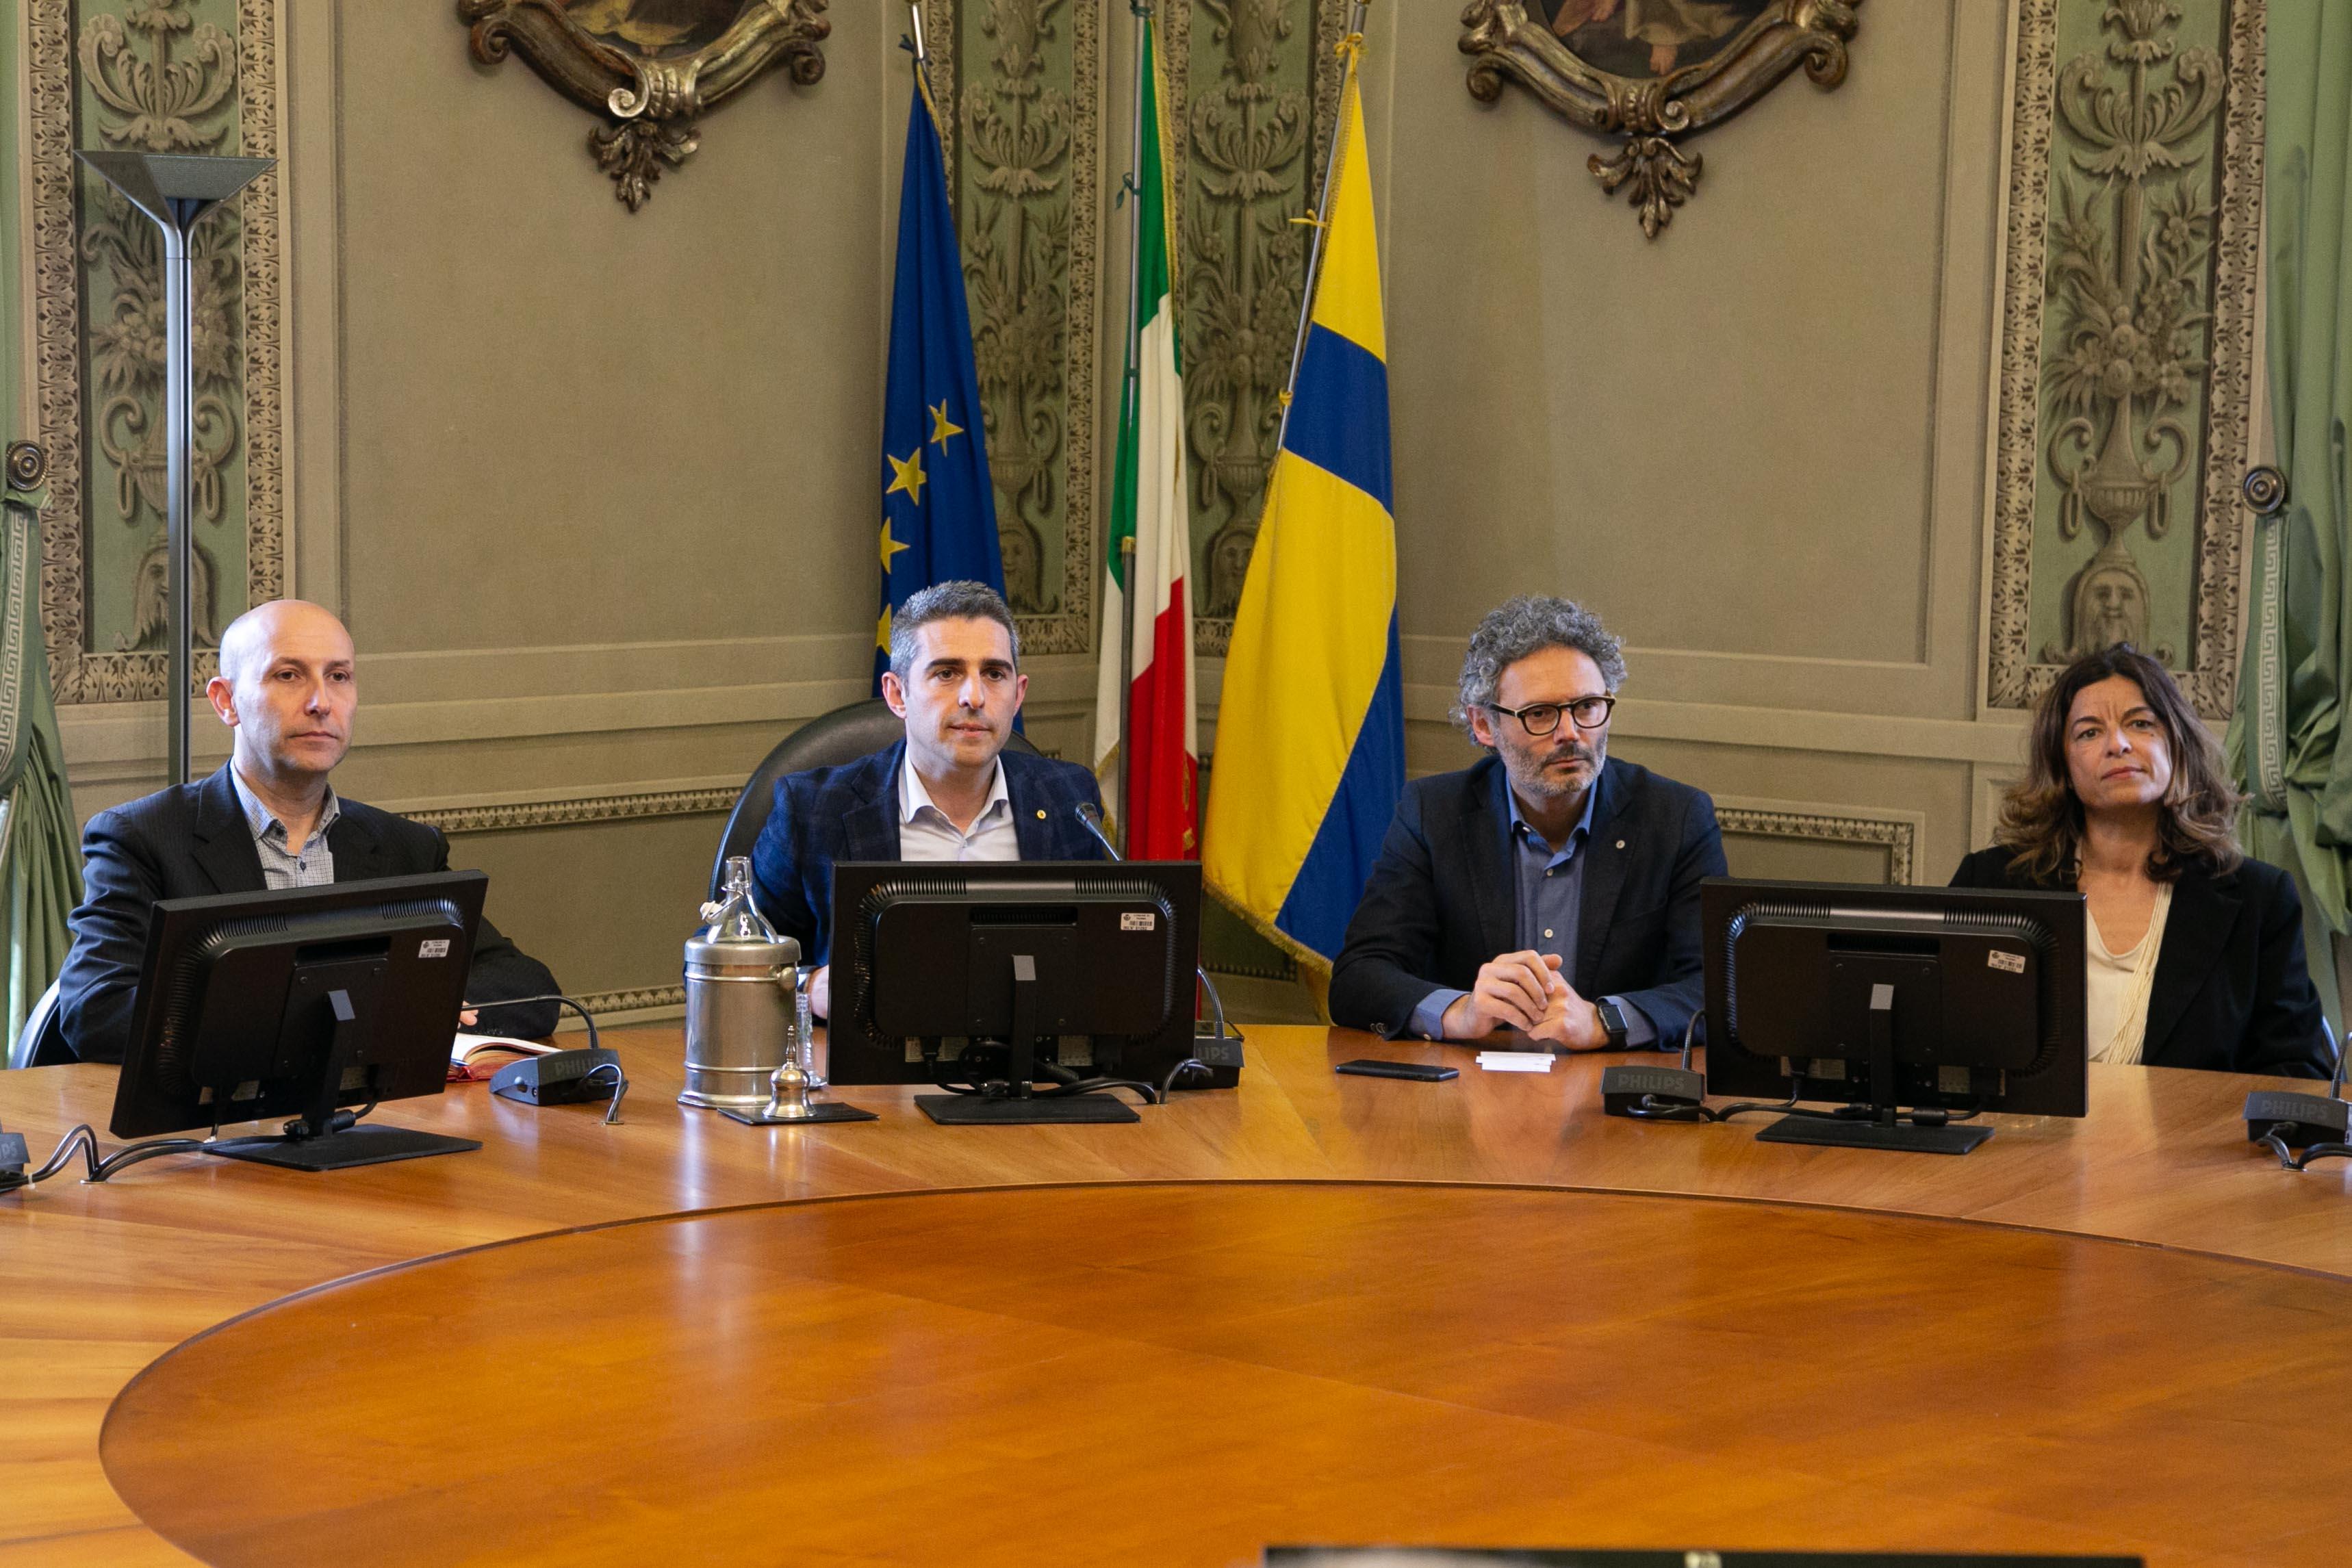 2019-04-09-Pizzarotti-Benassi-Alinovi-Cirillo-Pontremolese-2